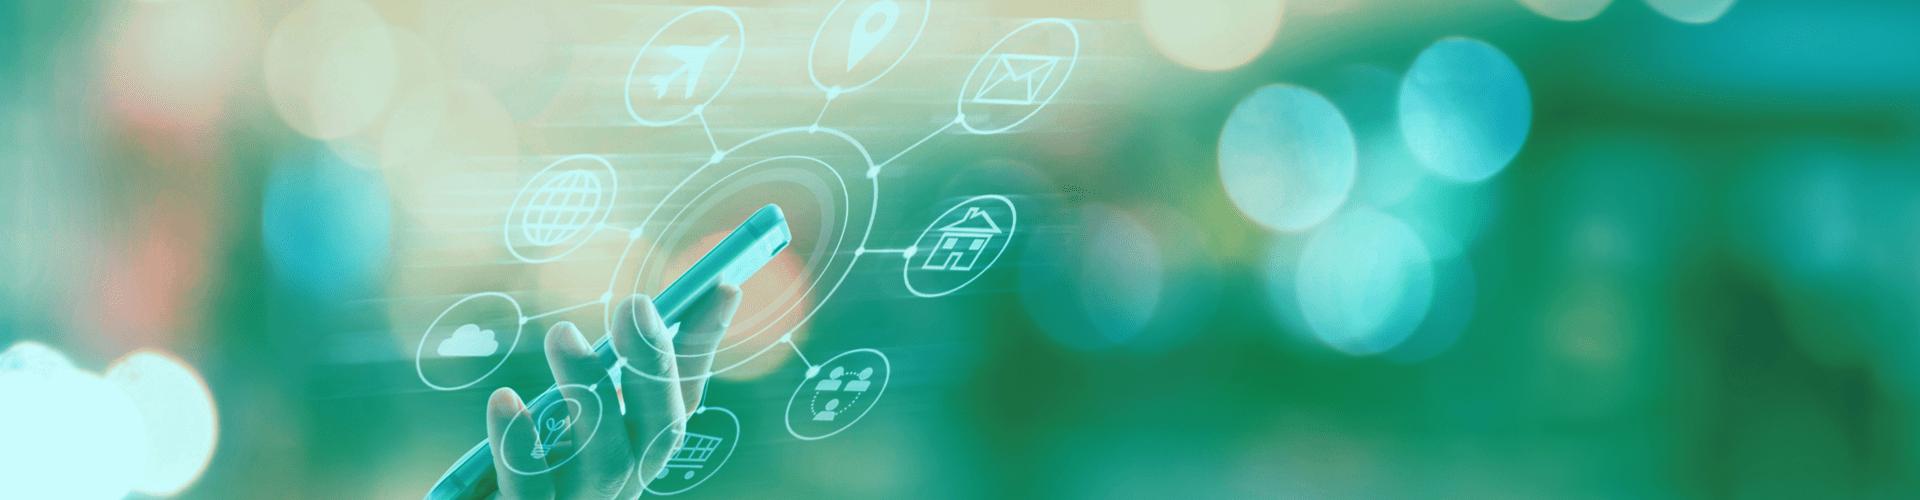 How PureWeb built an enterprise 3D streaming and collaboration platform